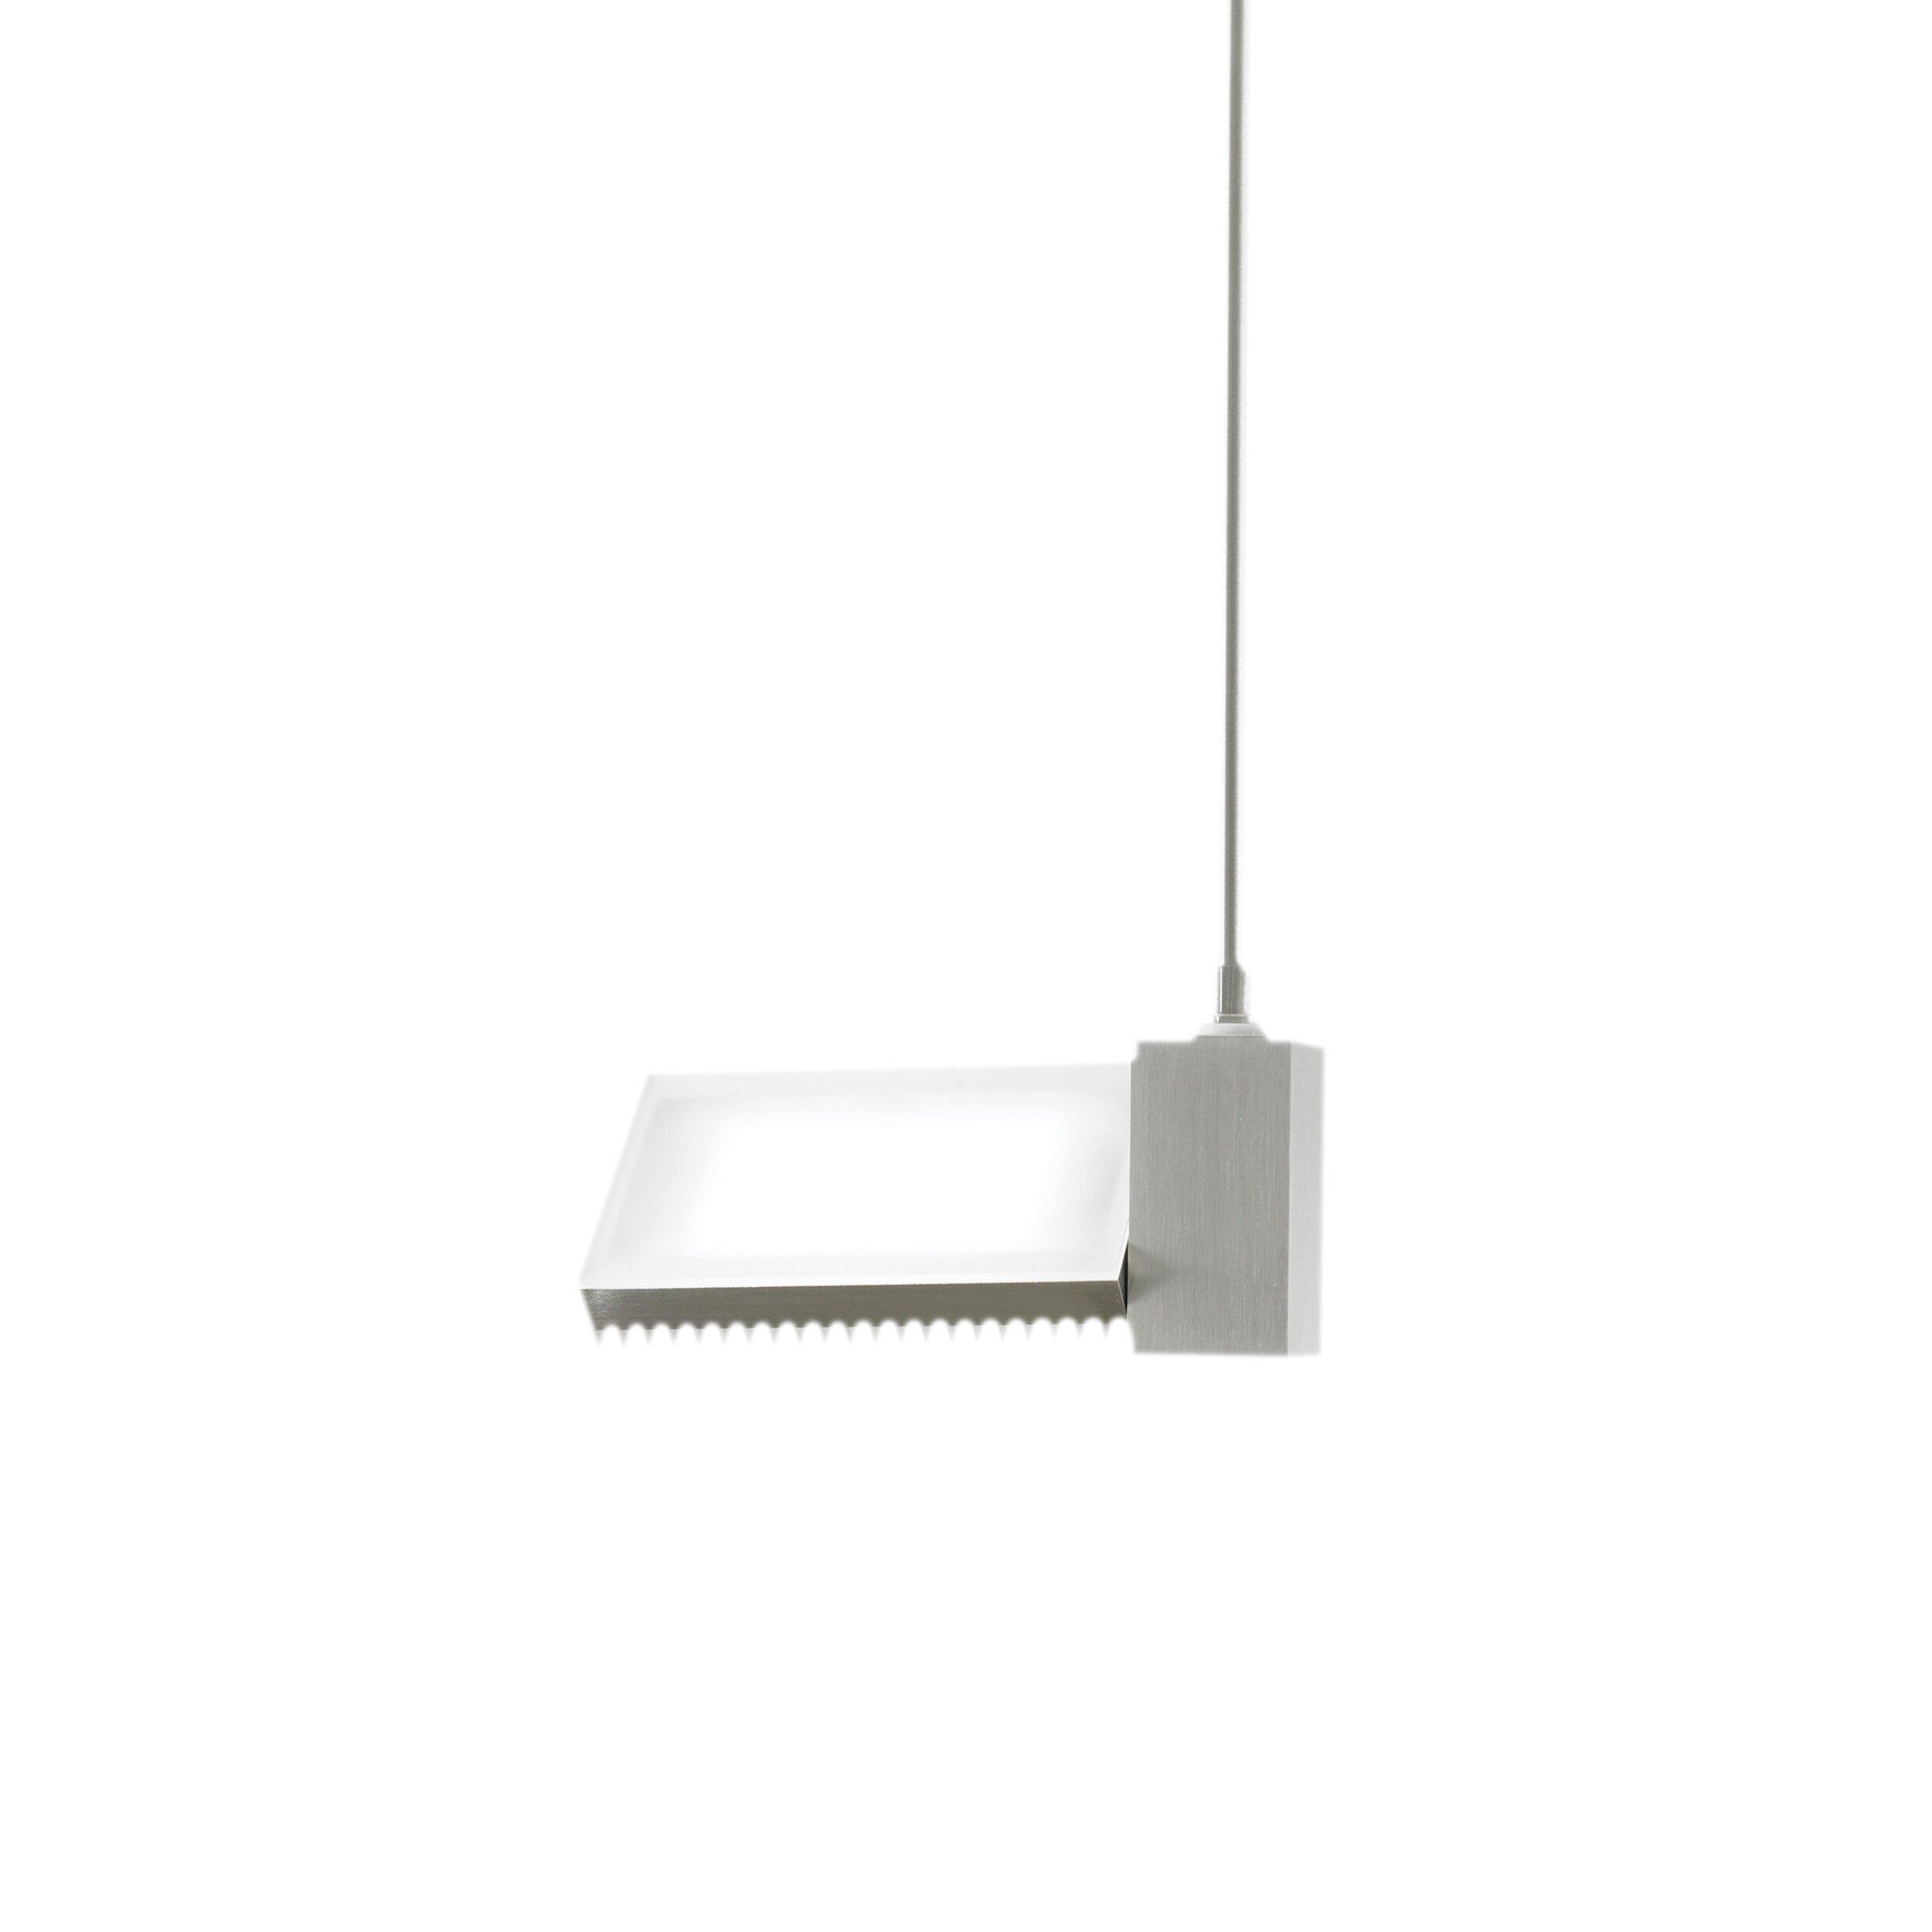 Tech Lighting Trace: Tech Lighting IBISS 1 Light Flood Edge Lit Single LED